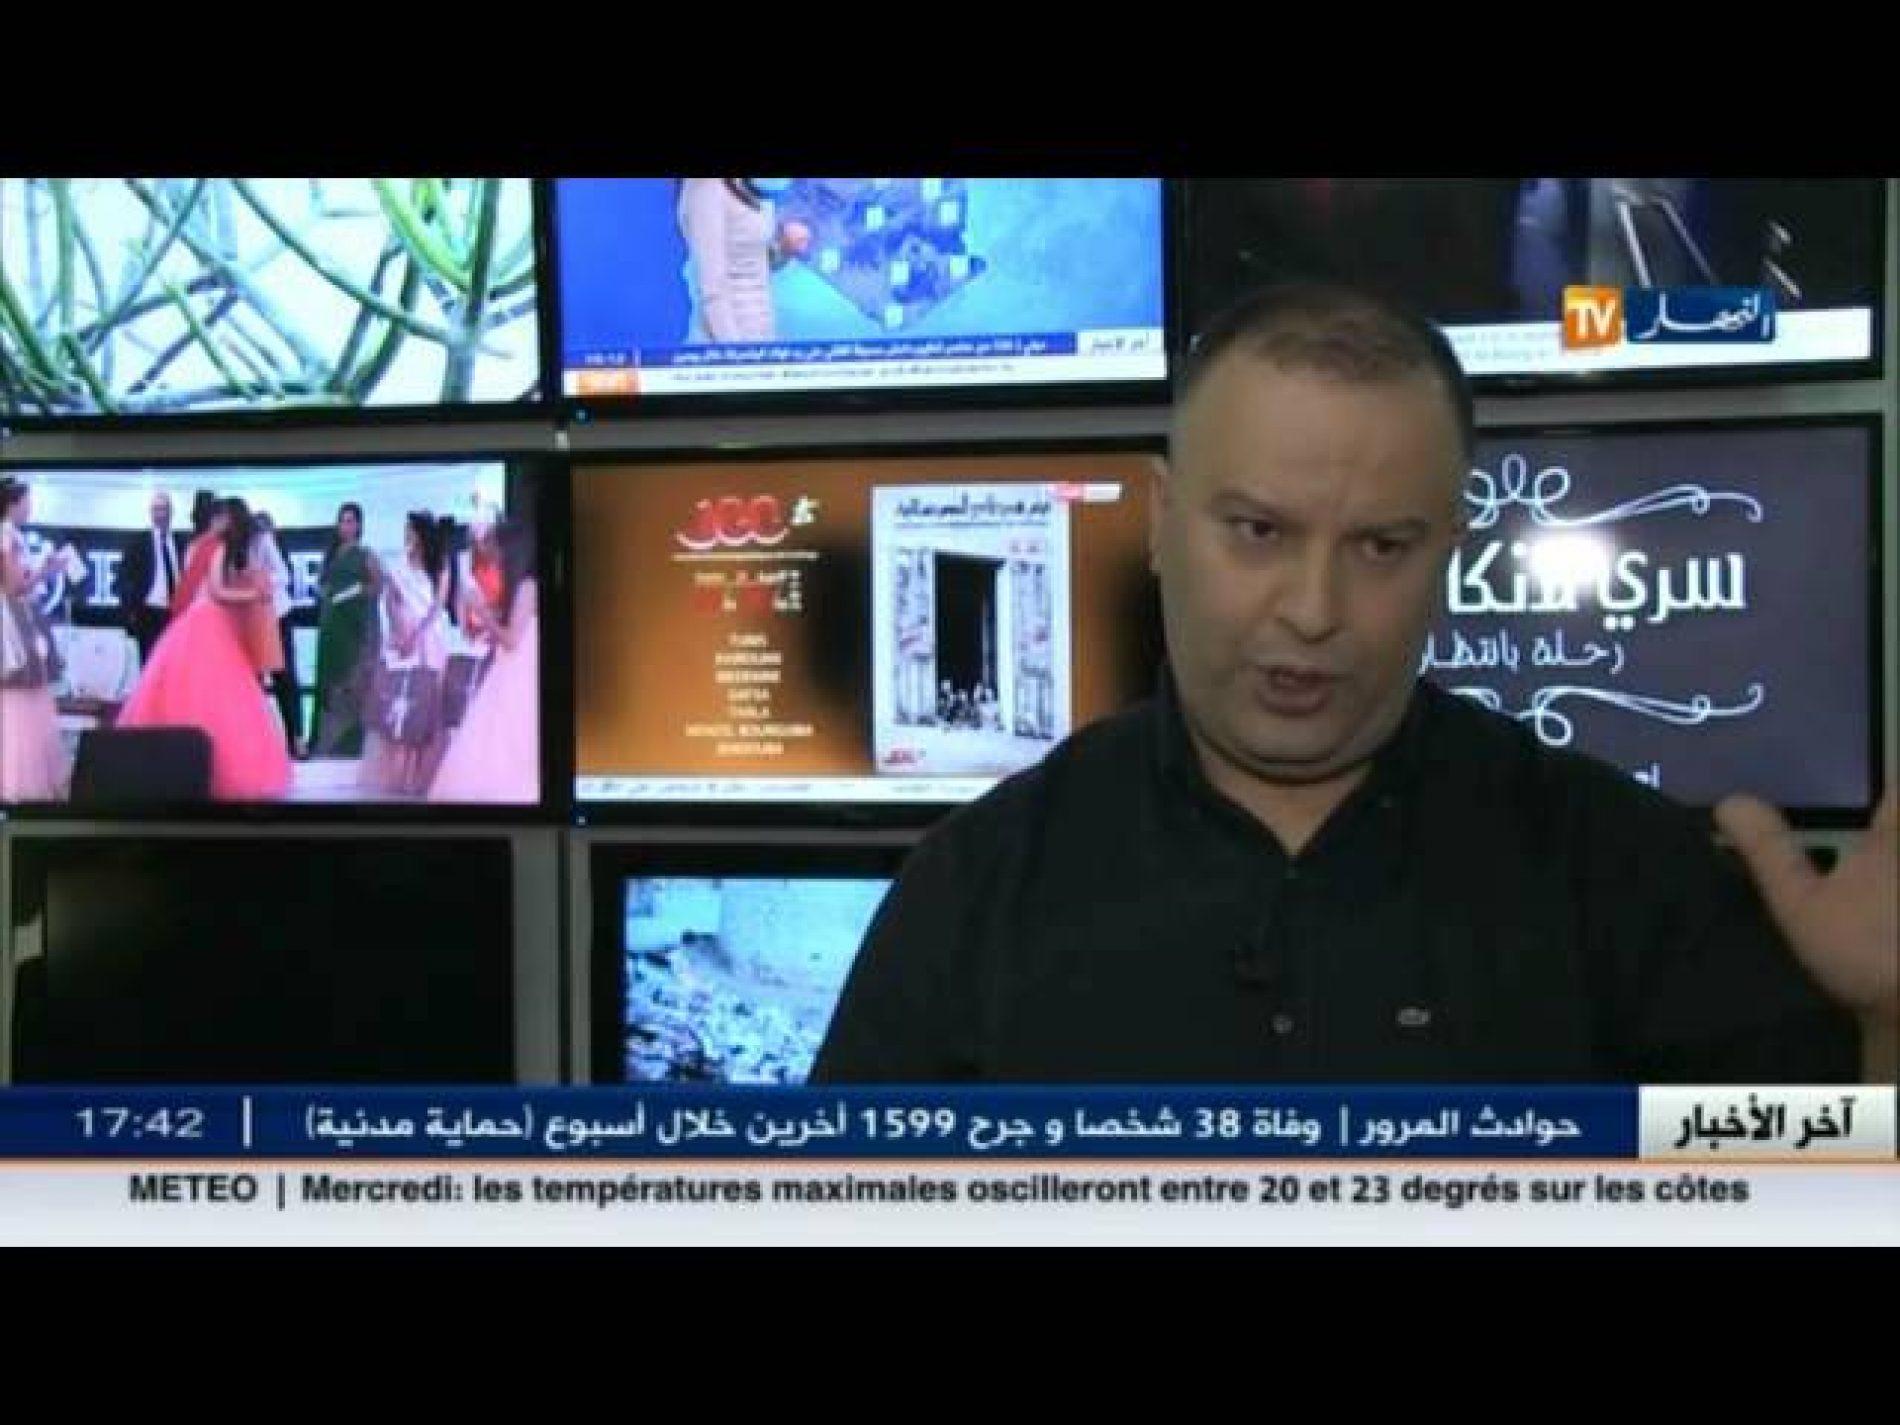 Selon Ennahar, Rebrab serait responsable du crash du vol d'EgyptAir